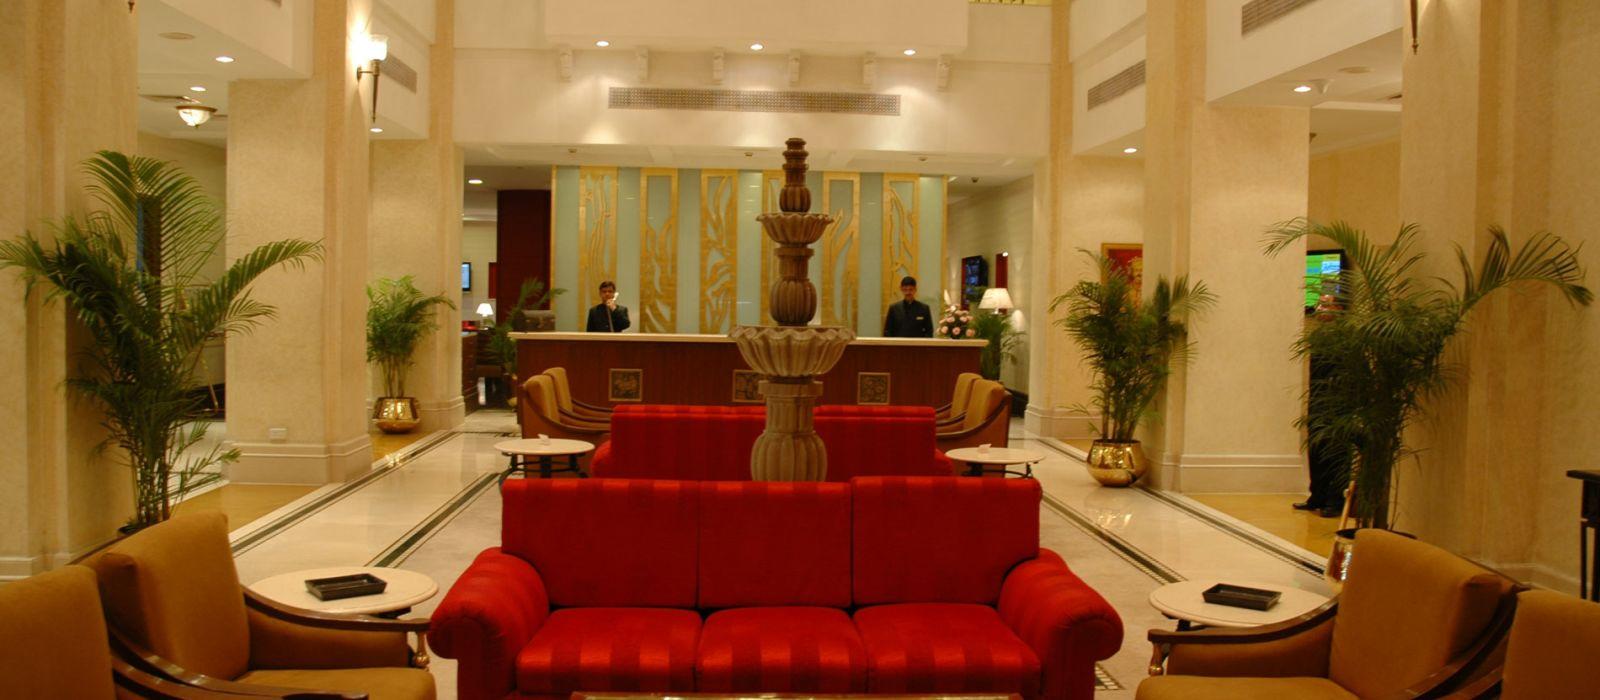 Hotel Radisson  Varanasi North India